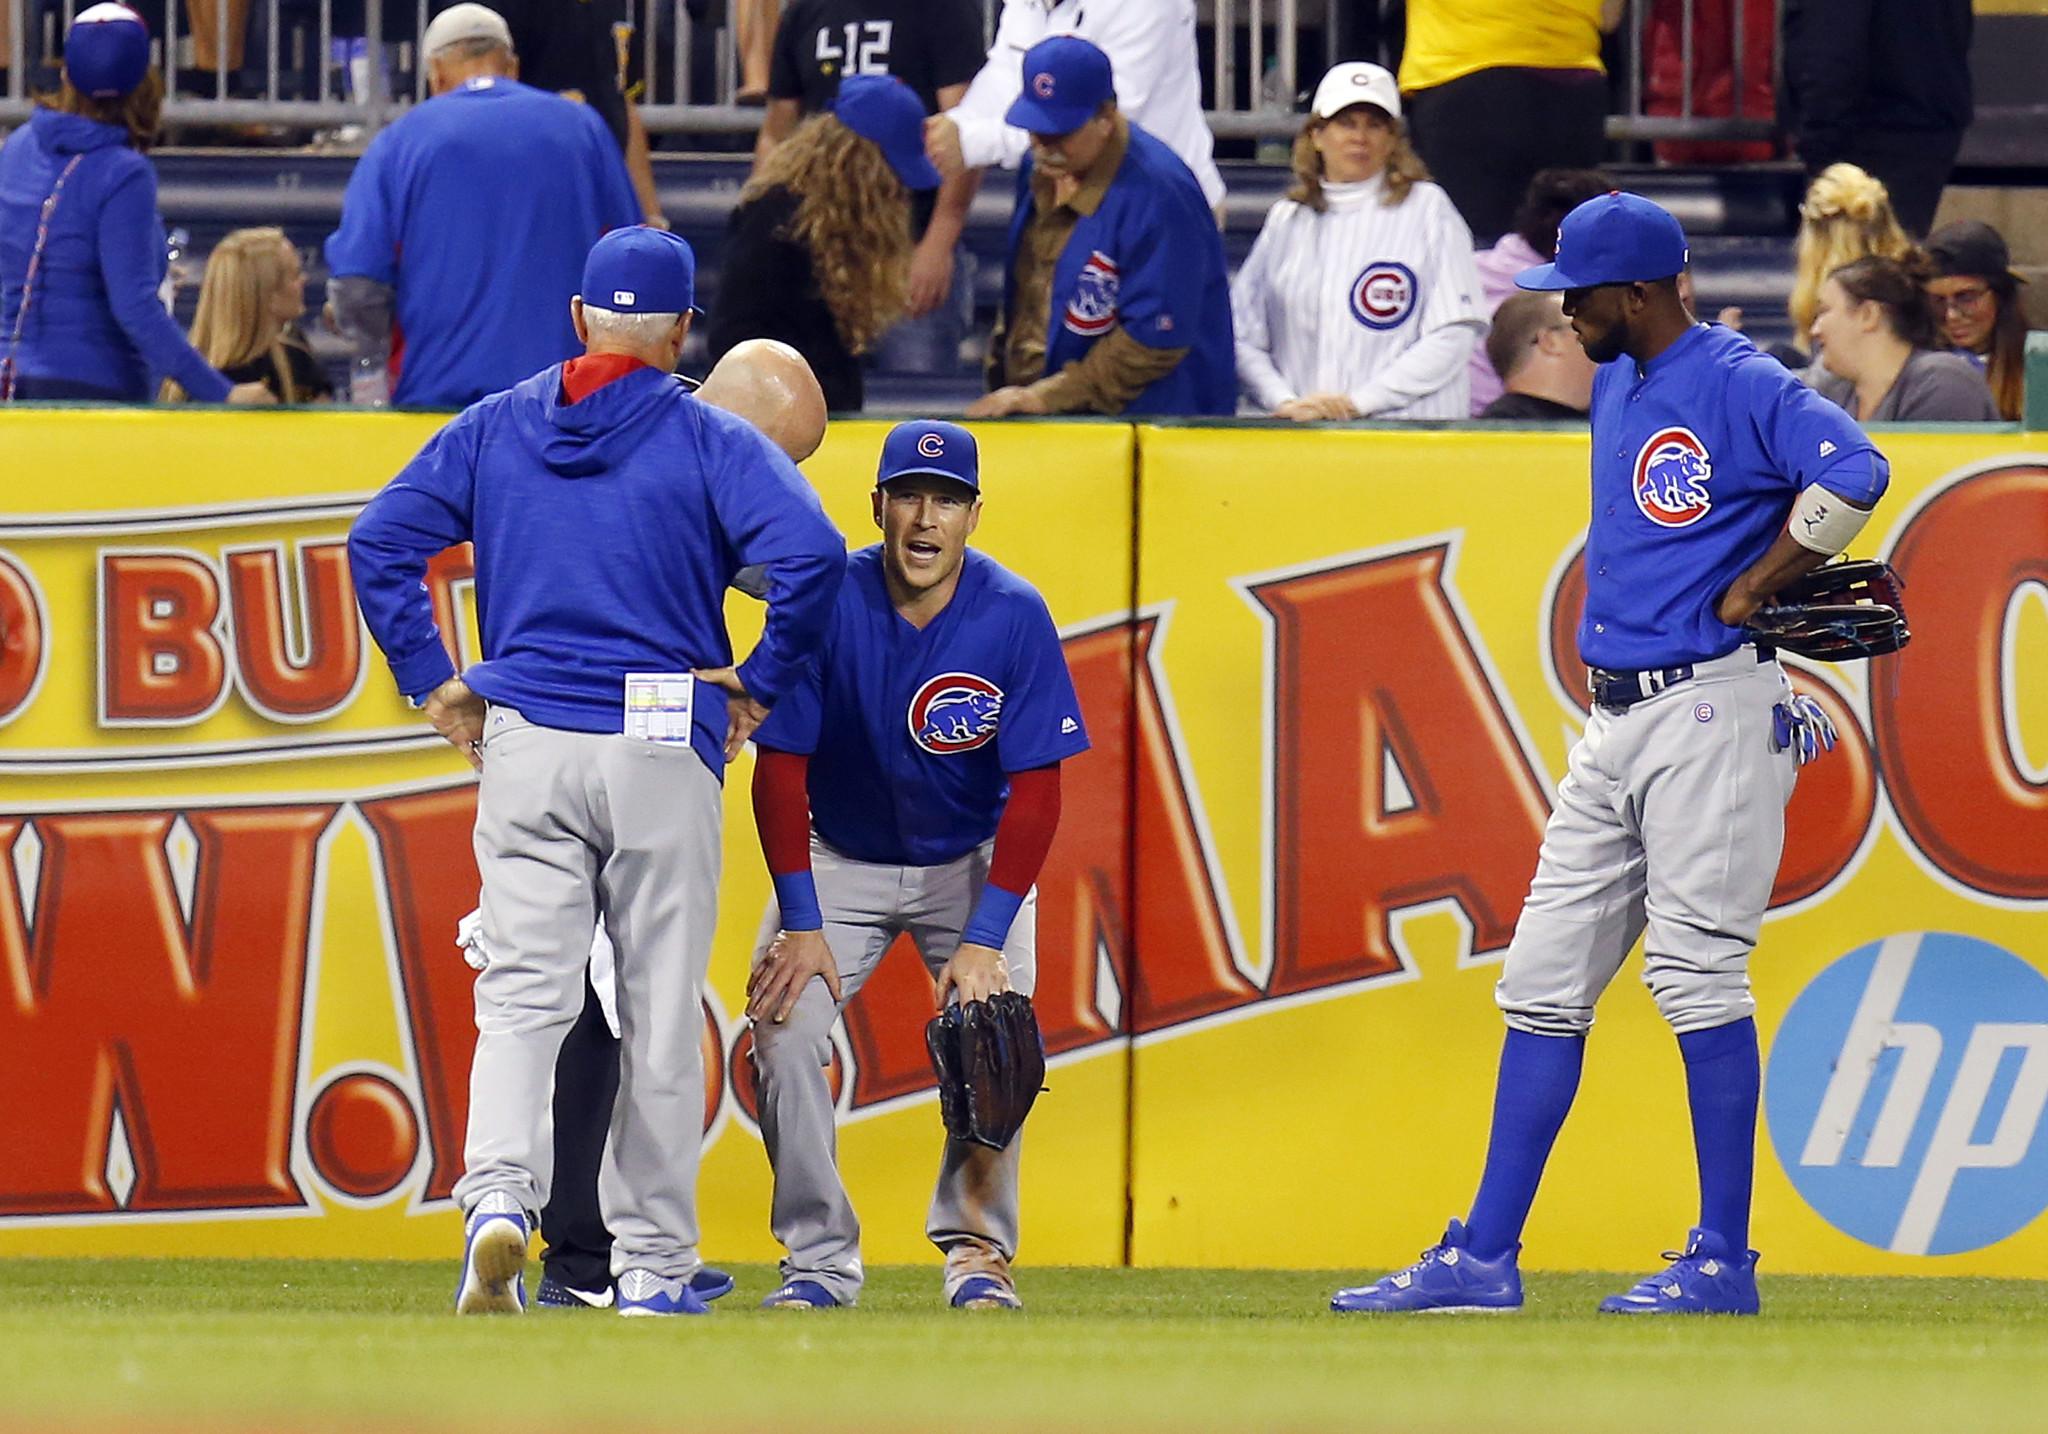 Jake Arrieta loses, but Chris Coghlan's left ankle bigger concern for Cubs - Baltimore Sun